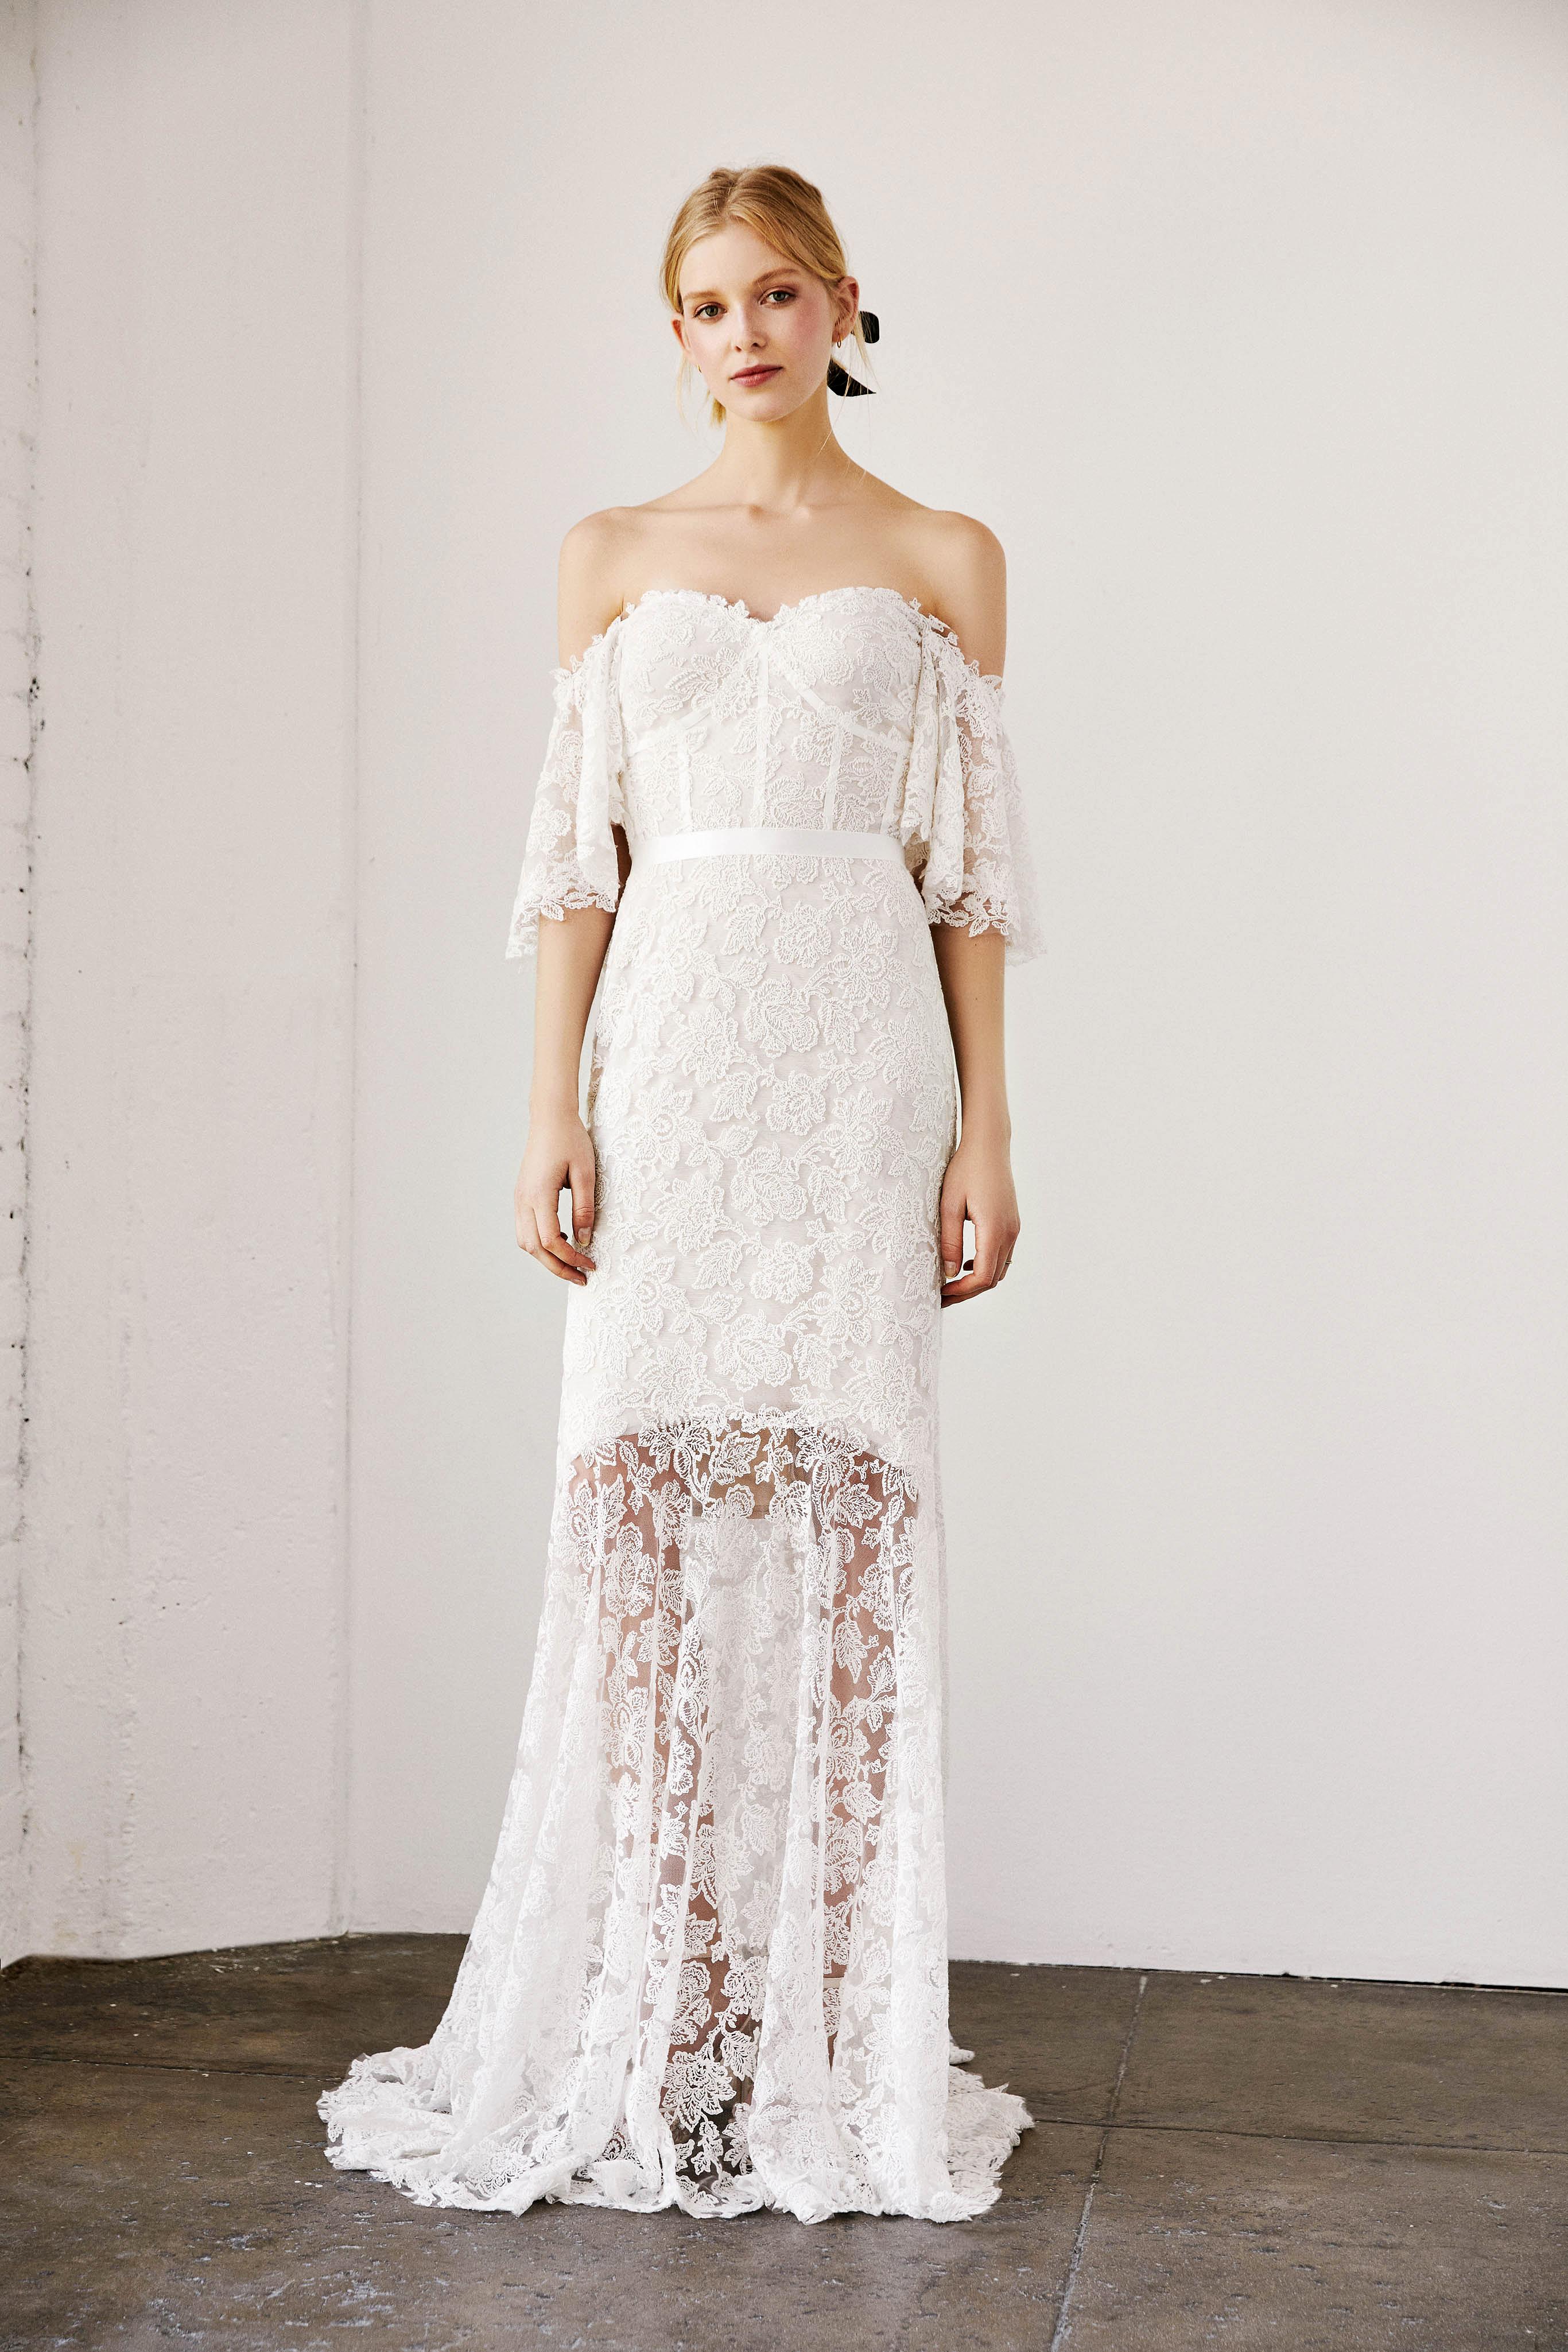 tadashi shoji wedding dress spring 2019 off the shoulder lace elbow length sleeves